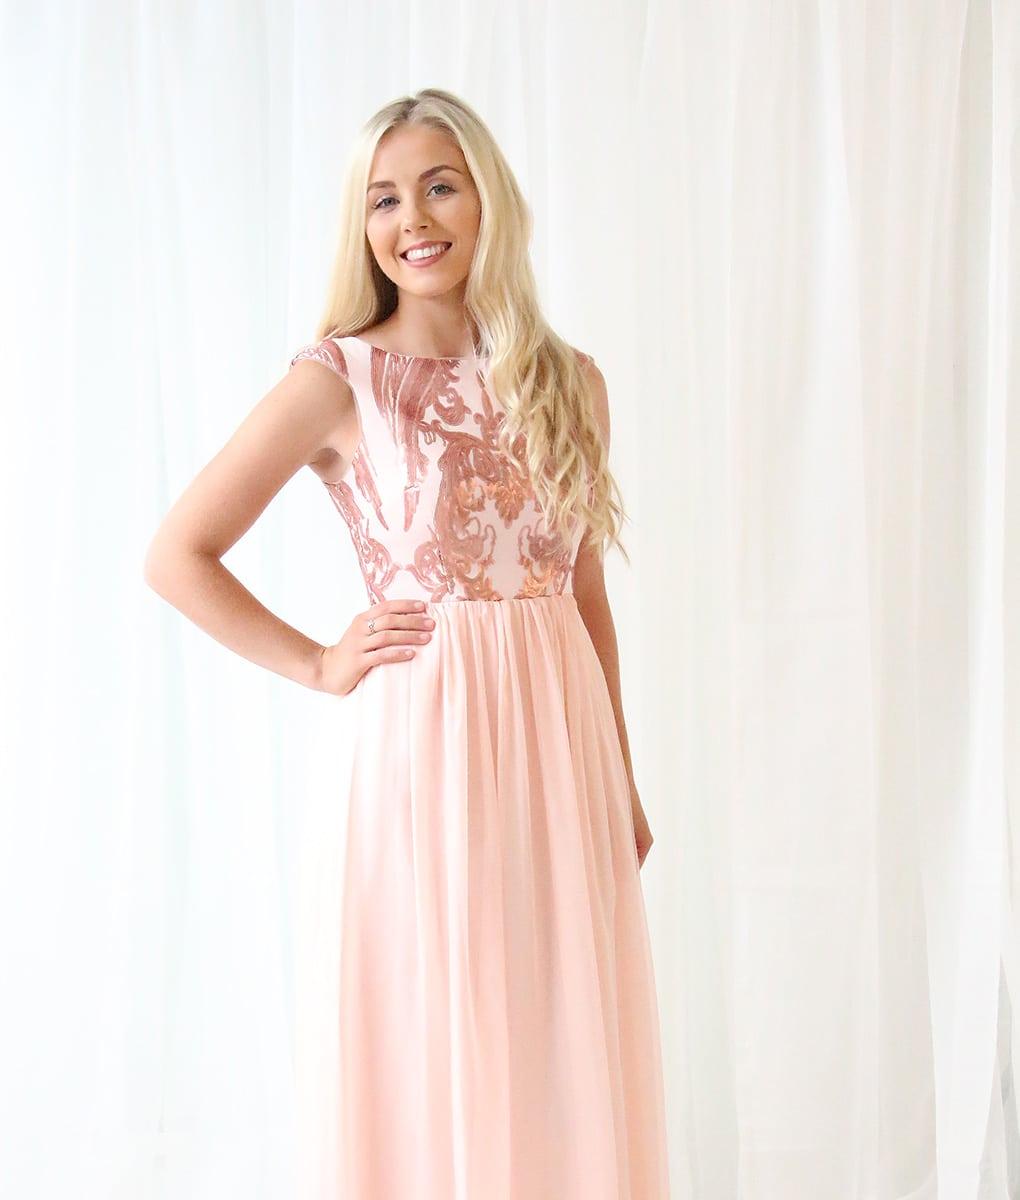 Alila-Blush-Chiffon-gown-Bariano